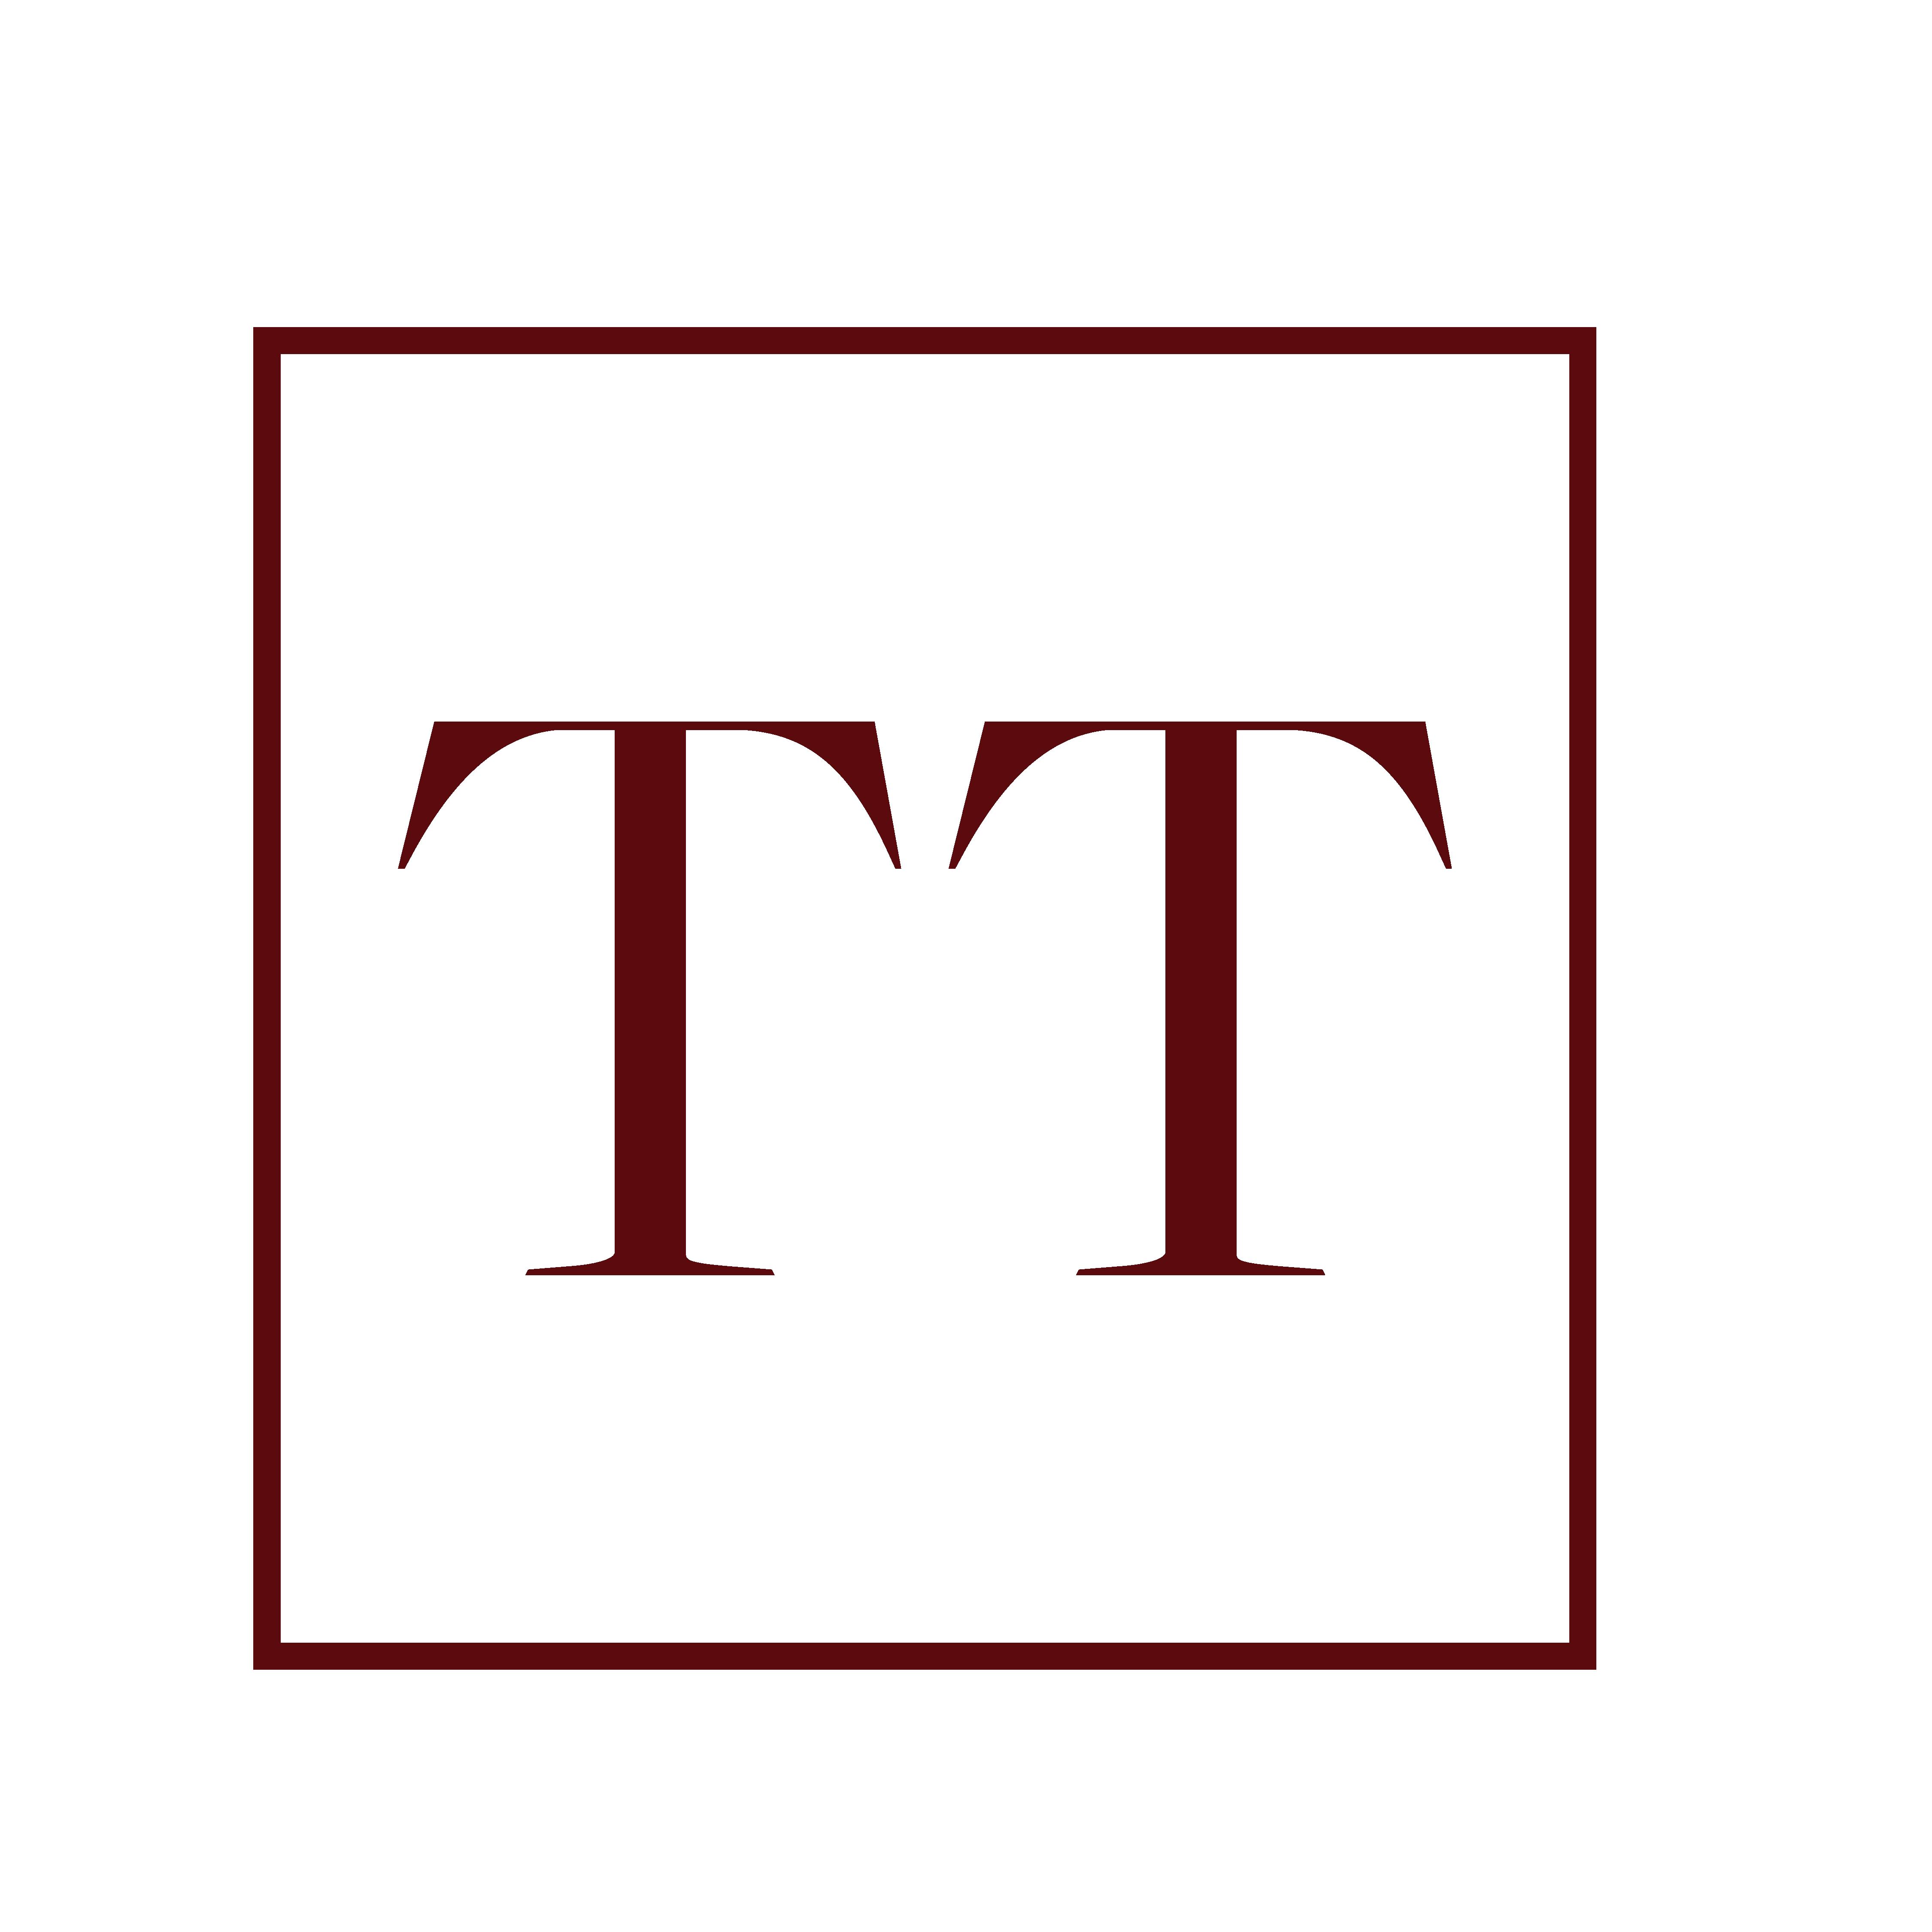 Tarka-Talent-Logos-07